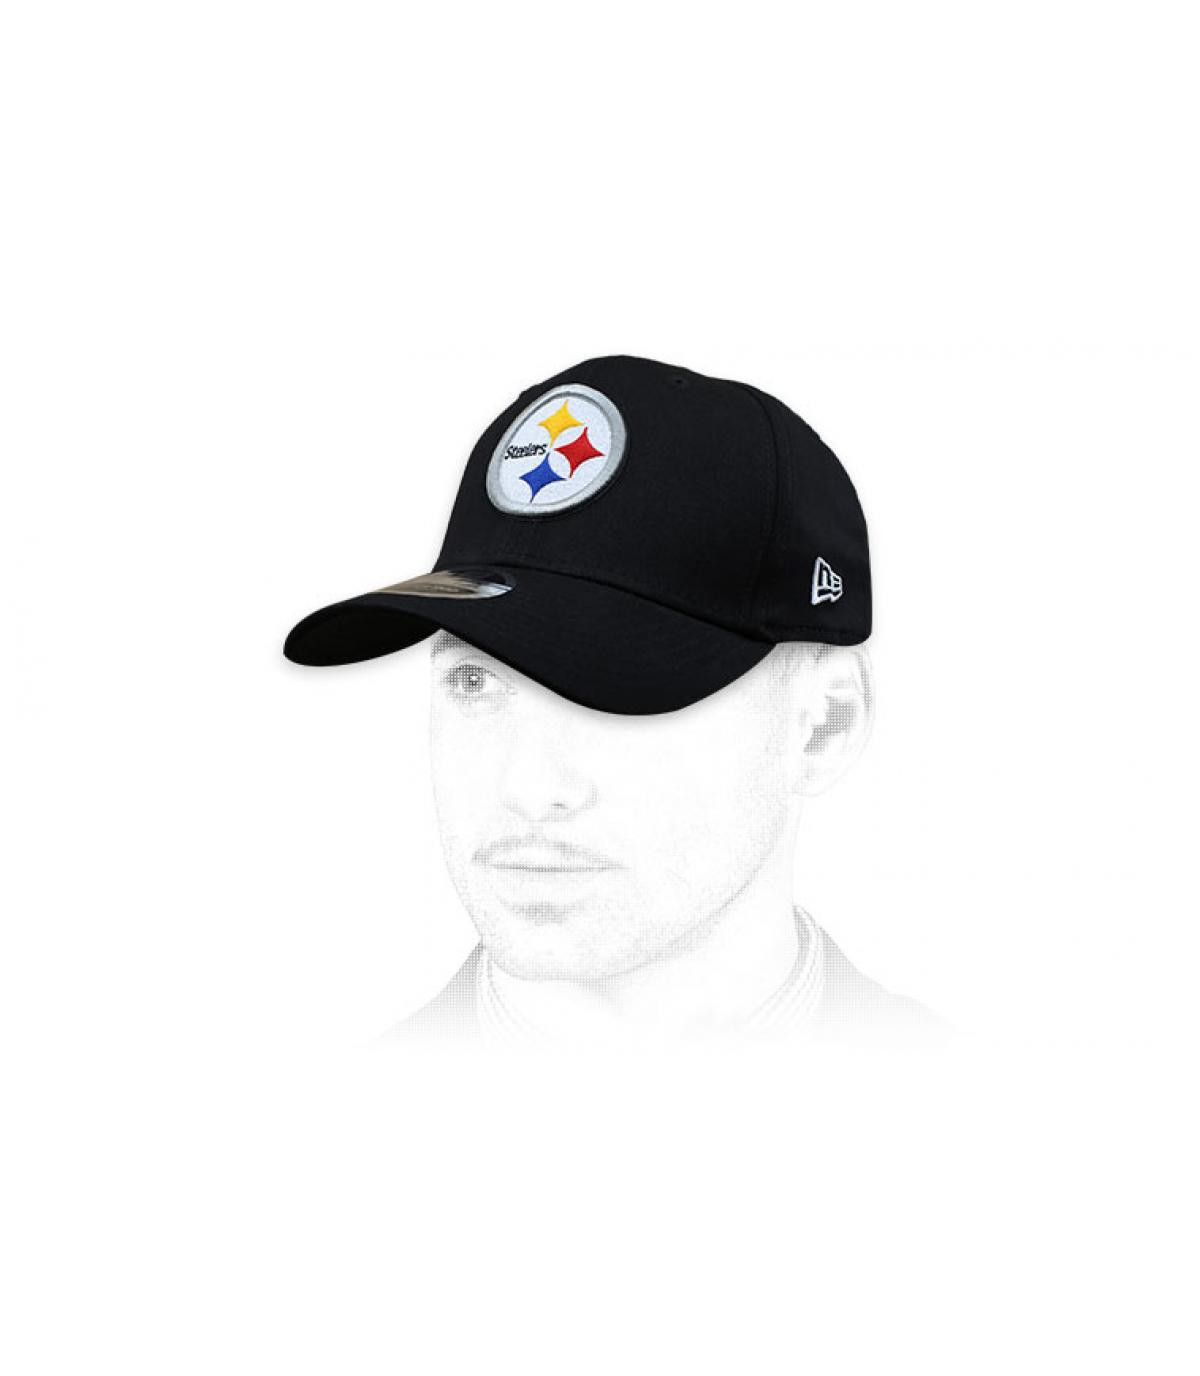 casquette Steelers noir